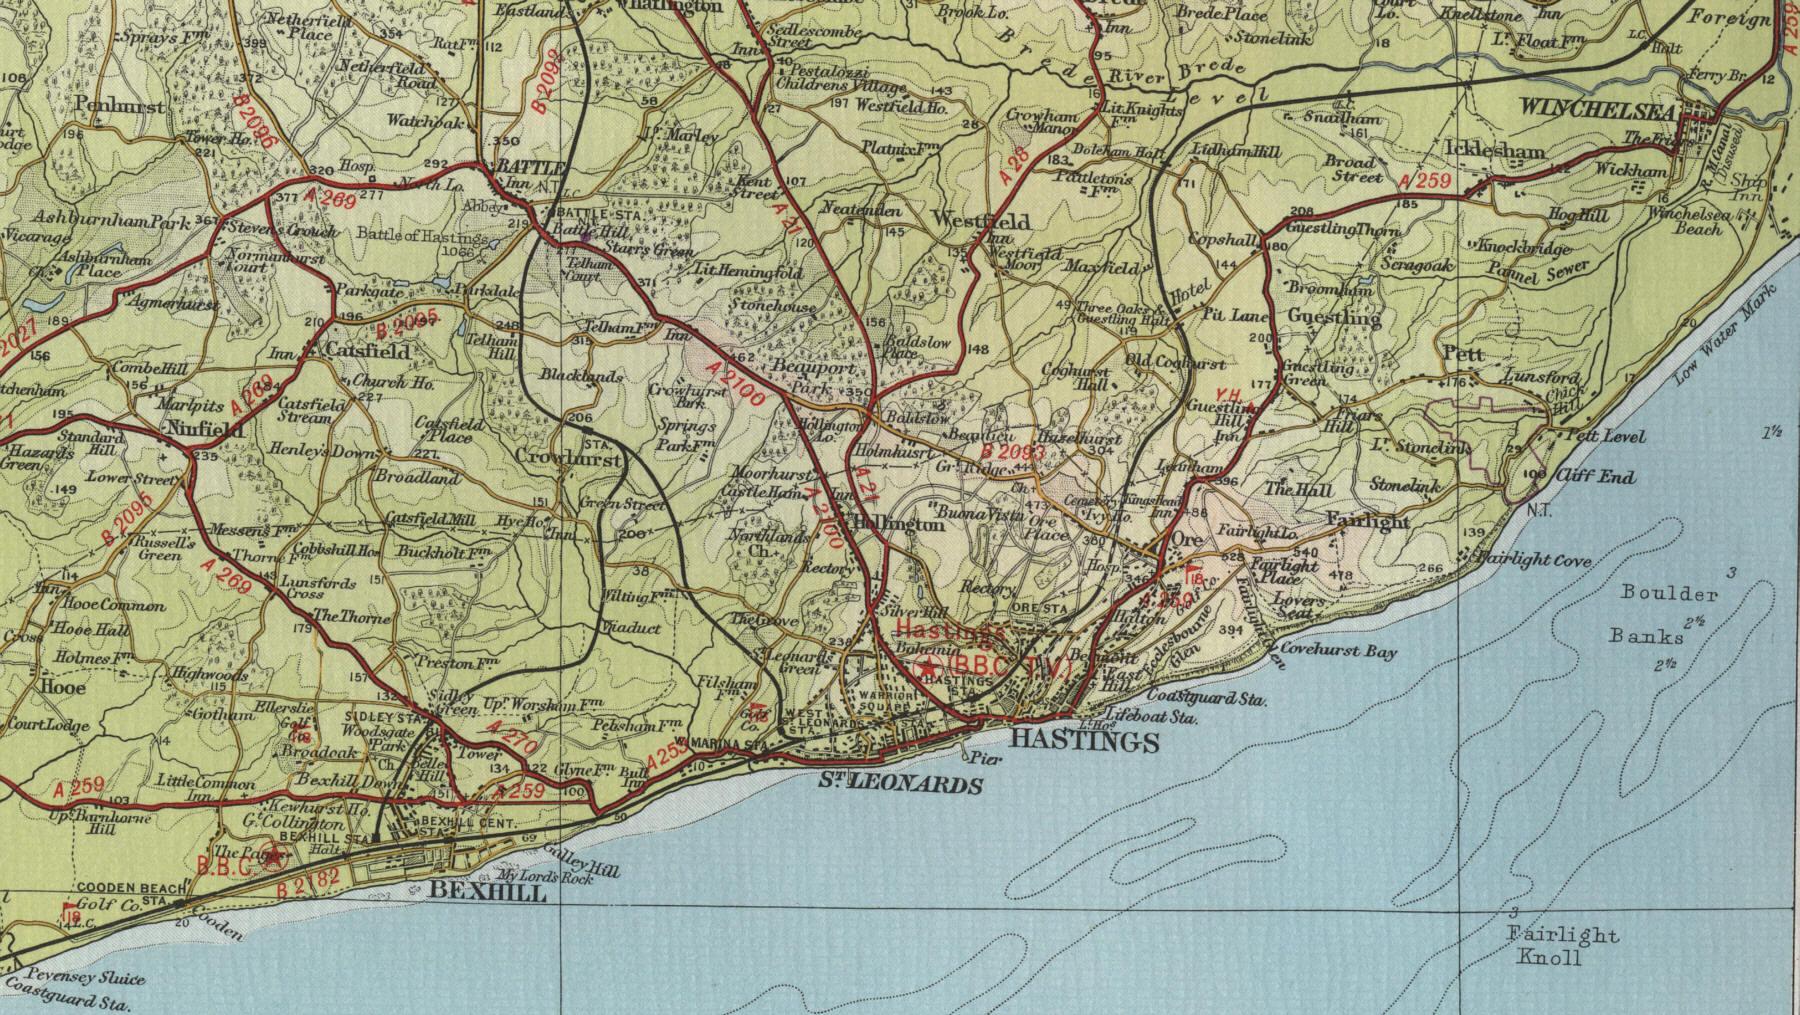 Map Of England Hastings.Hastings Map